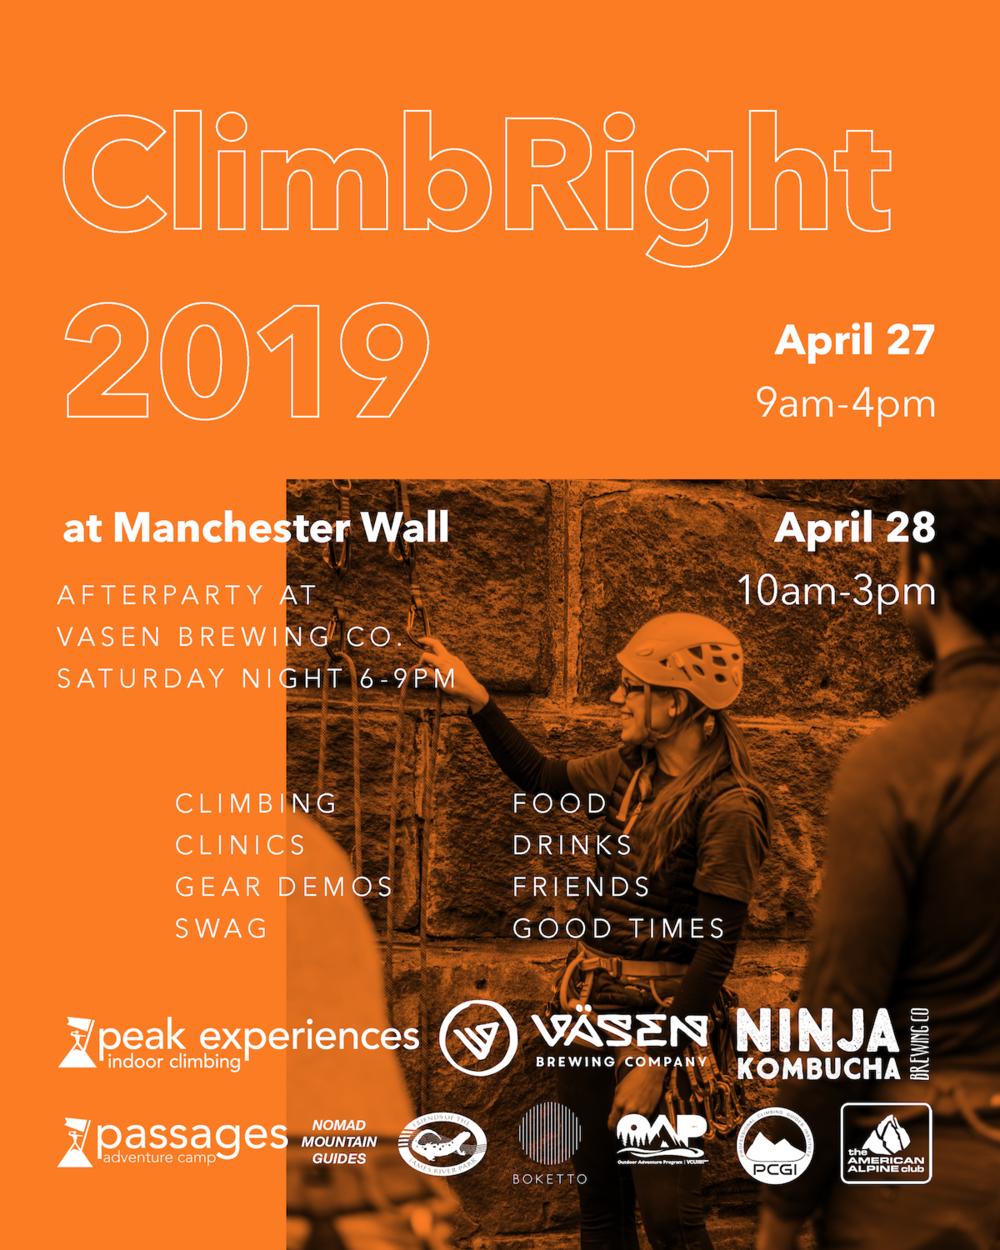 Peak-climb-right-2019.png